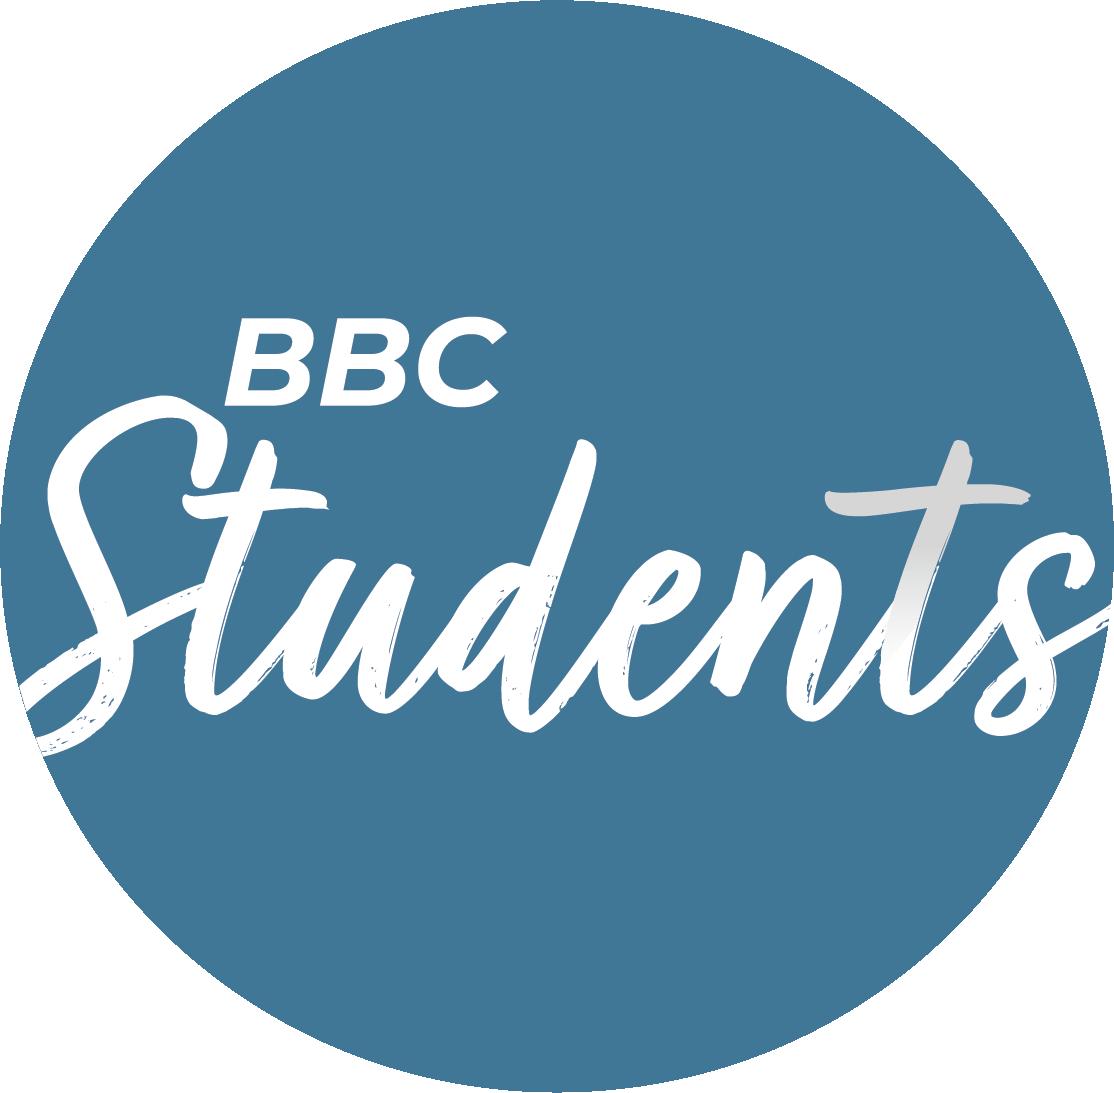 BBC Students logo